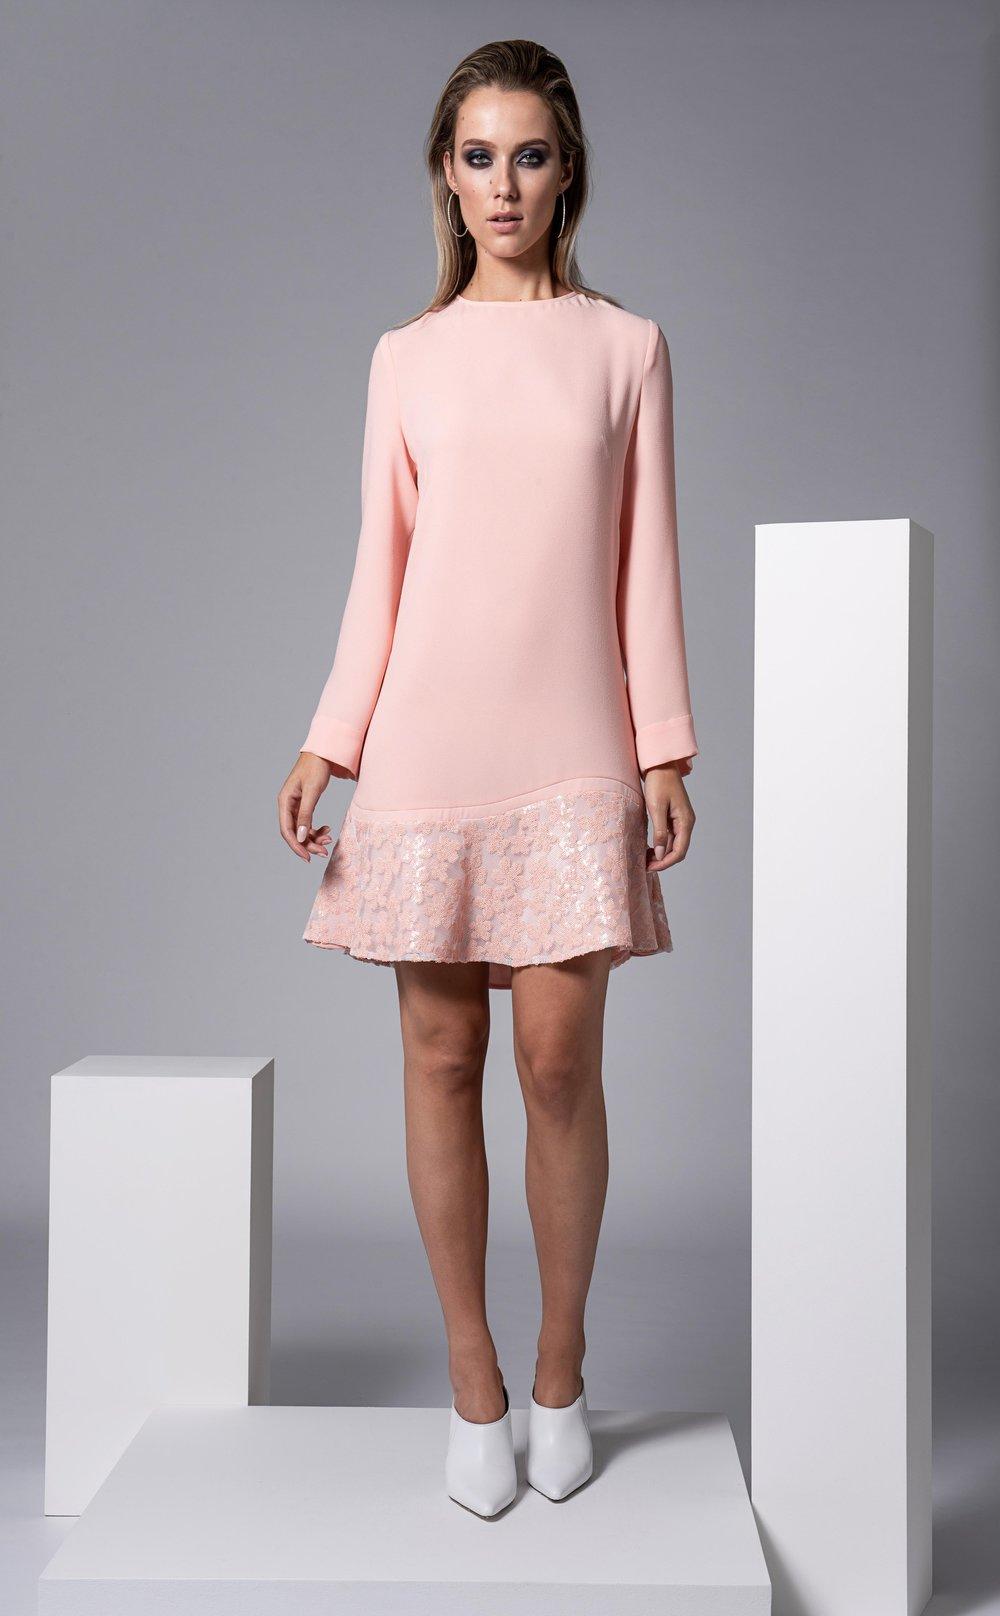 Barnes Dress in Blush Pink